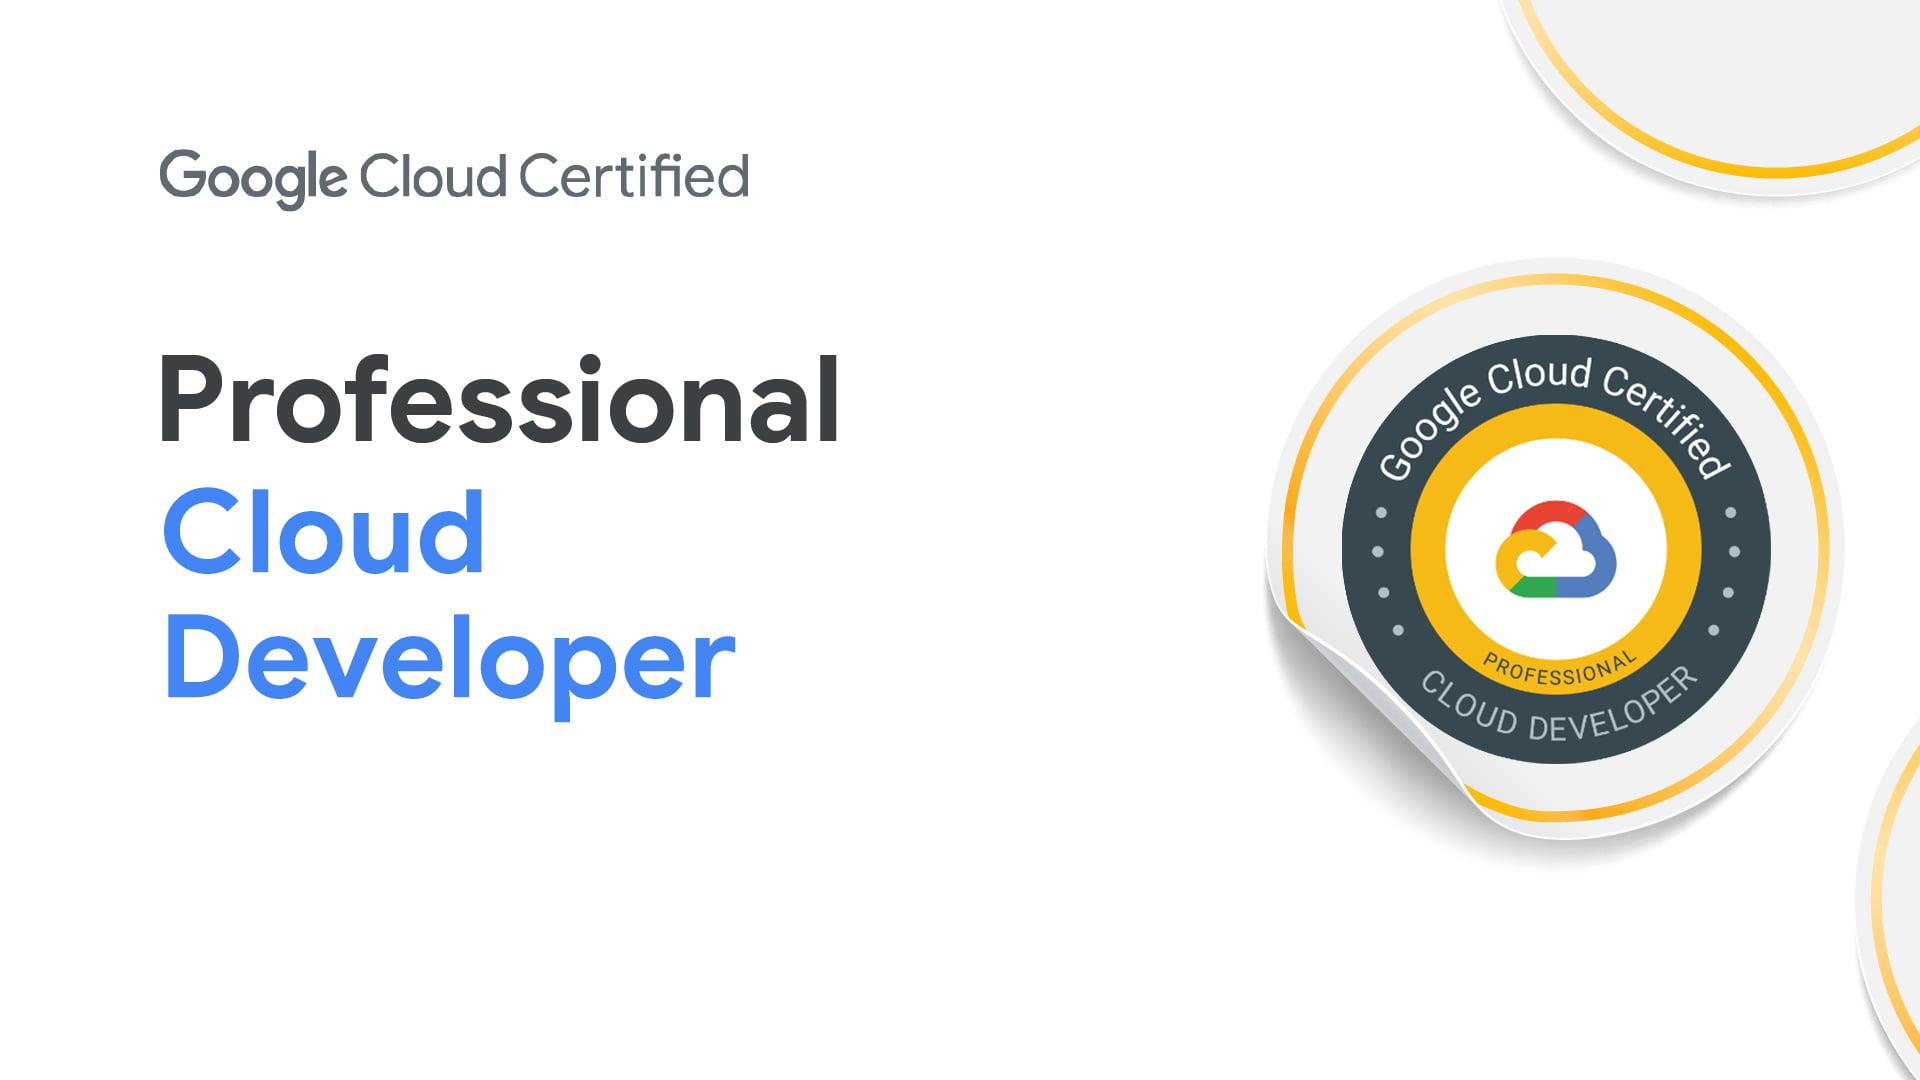 [GCP] Google Cloud Certified - Professional Cloud Developer